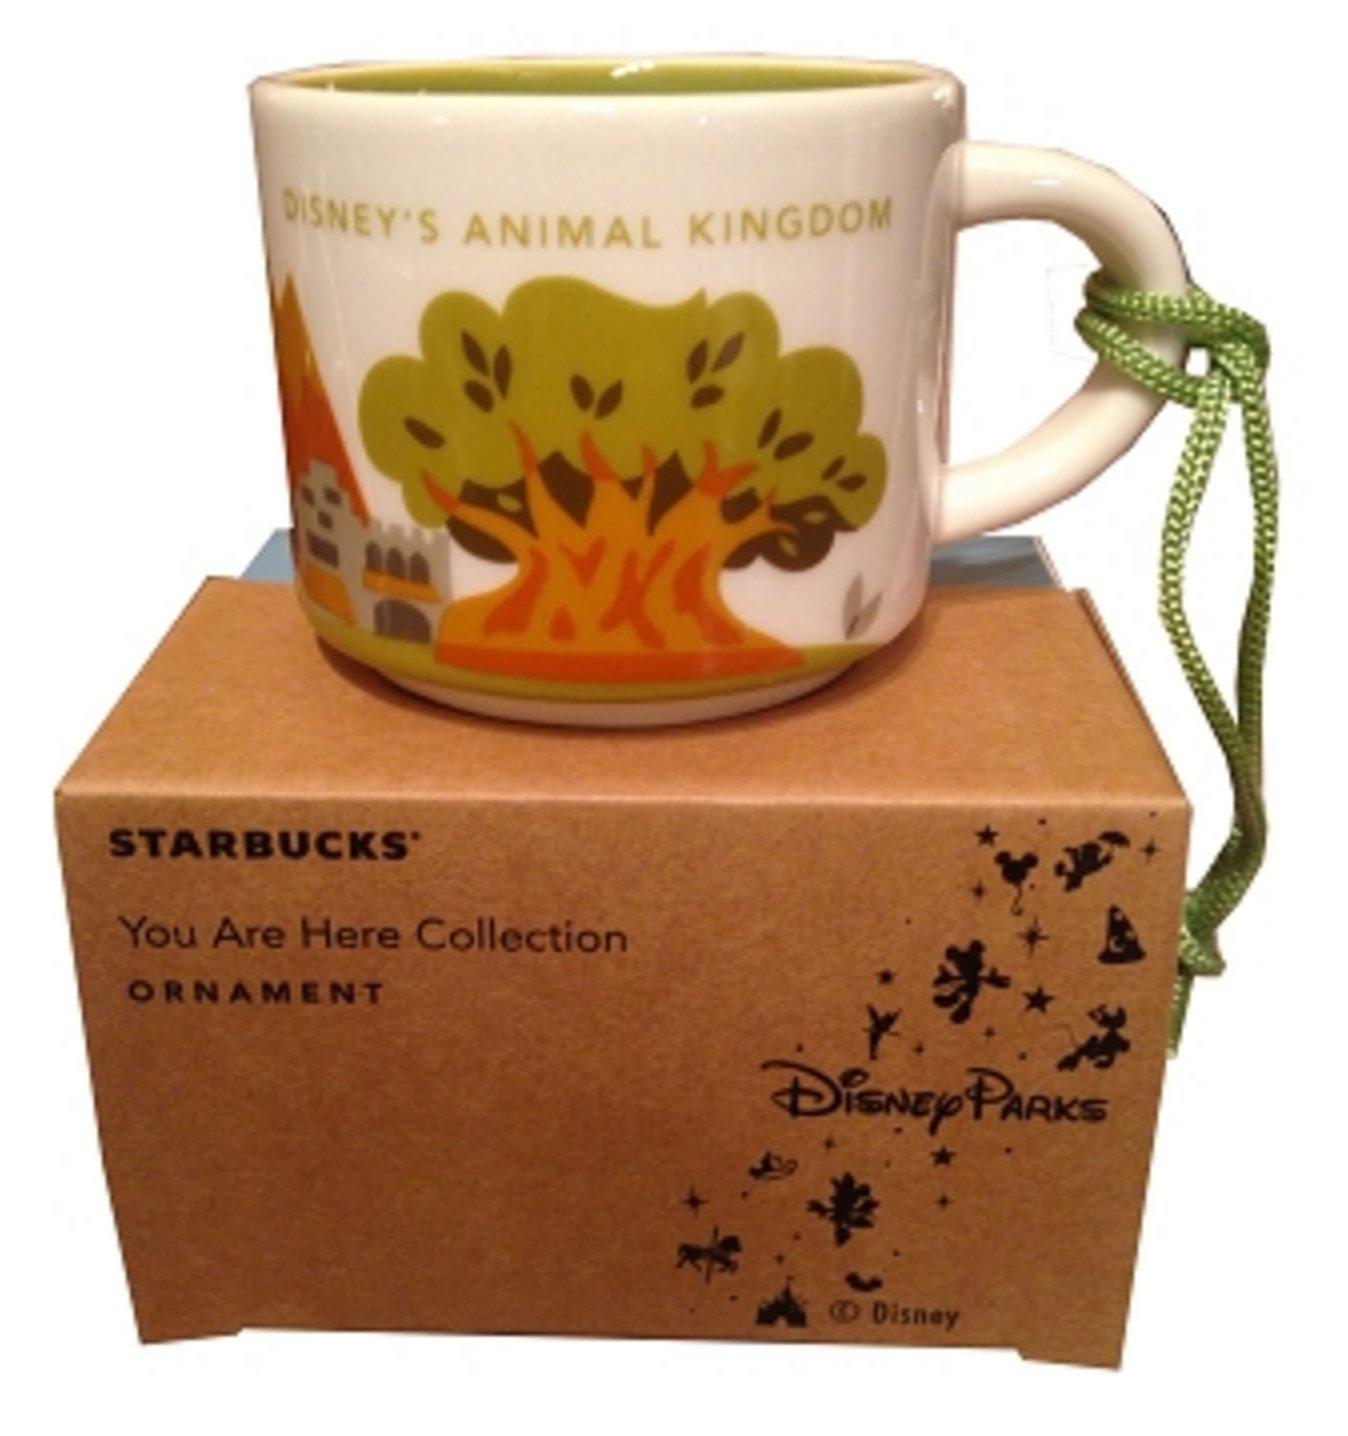 Disney Parks Starbucks You Are Here Animal Kingdom Mug Christmas Tree Ornament